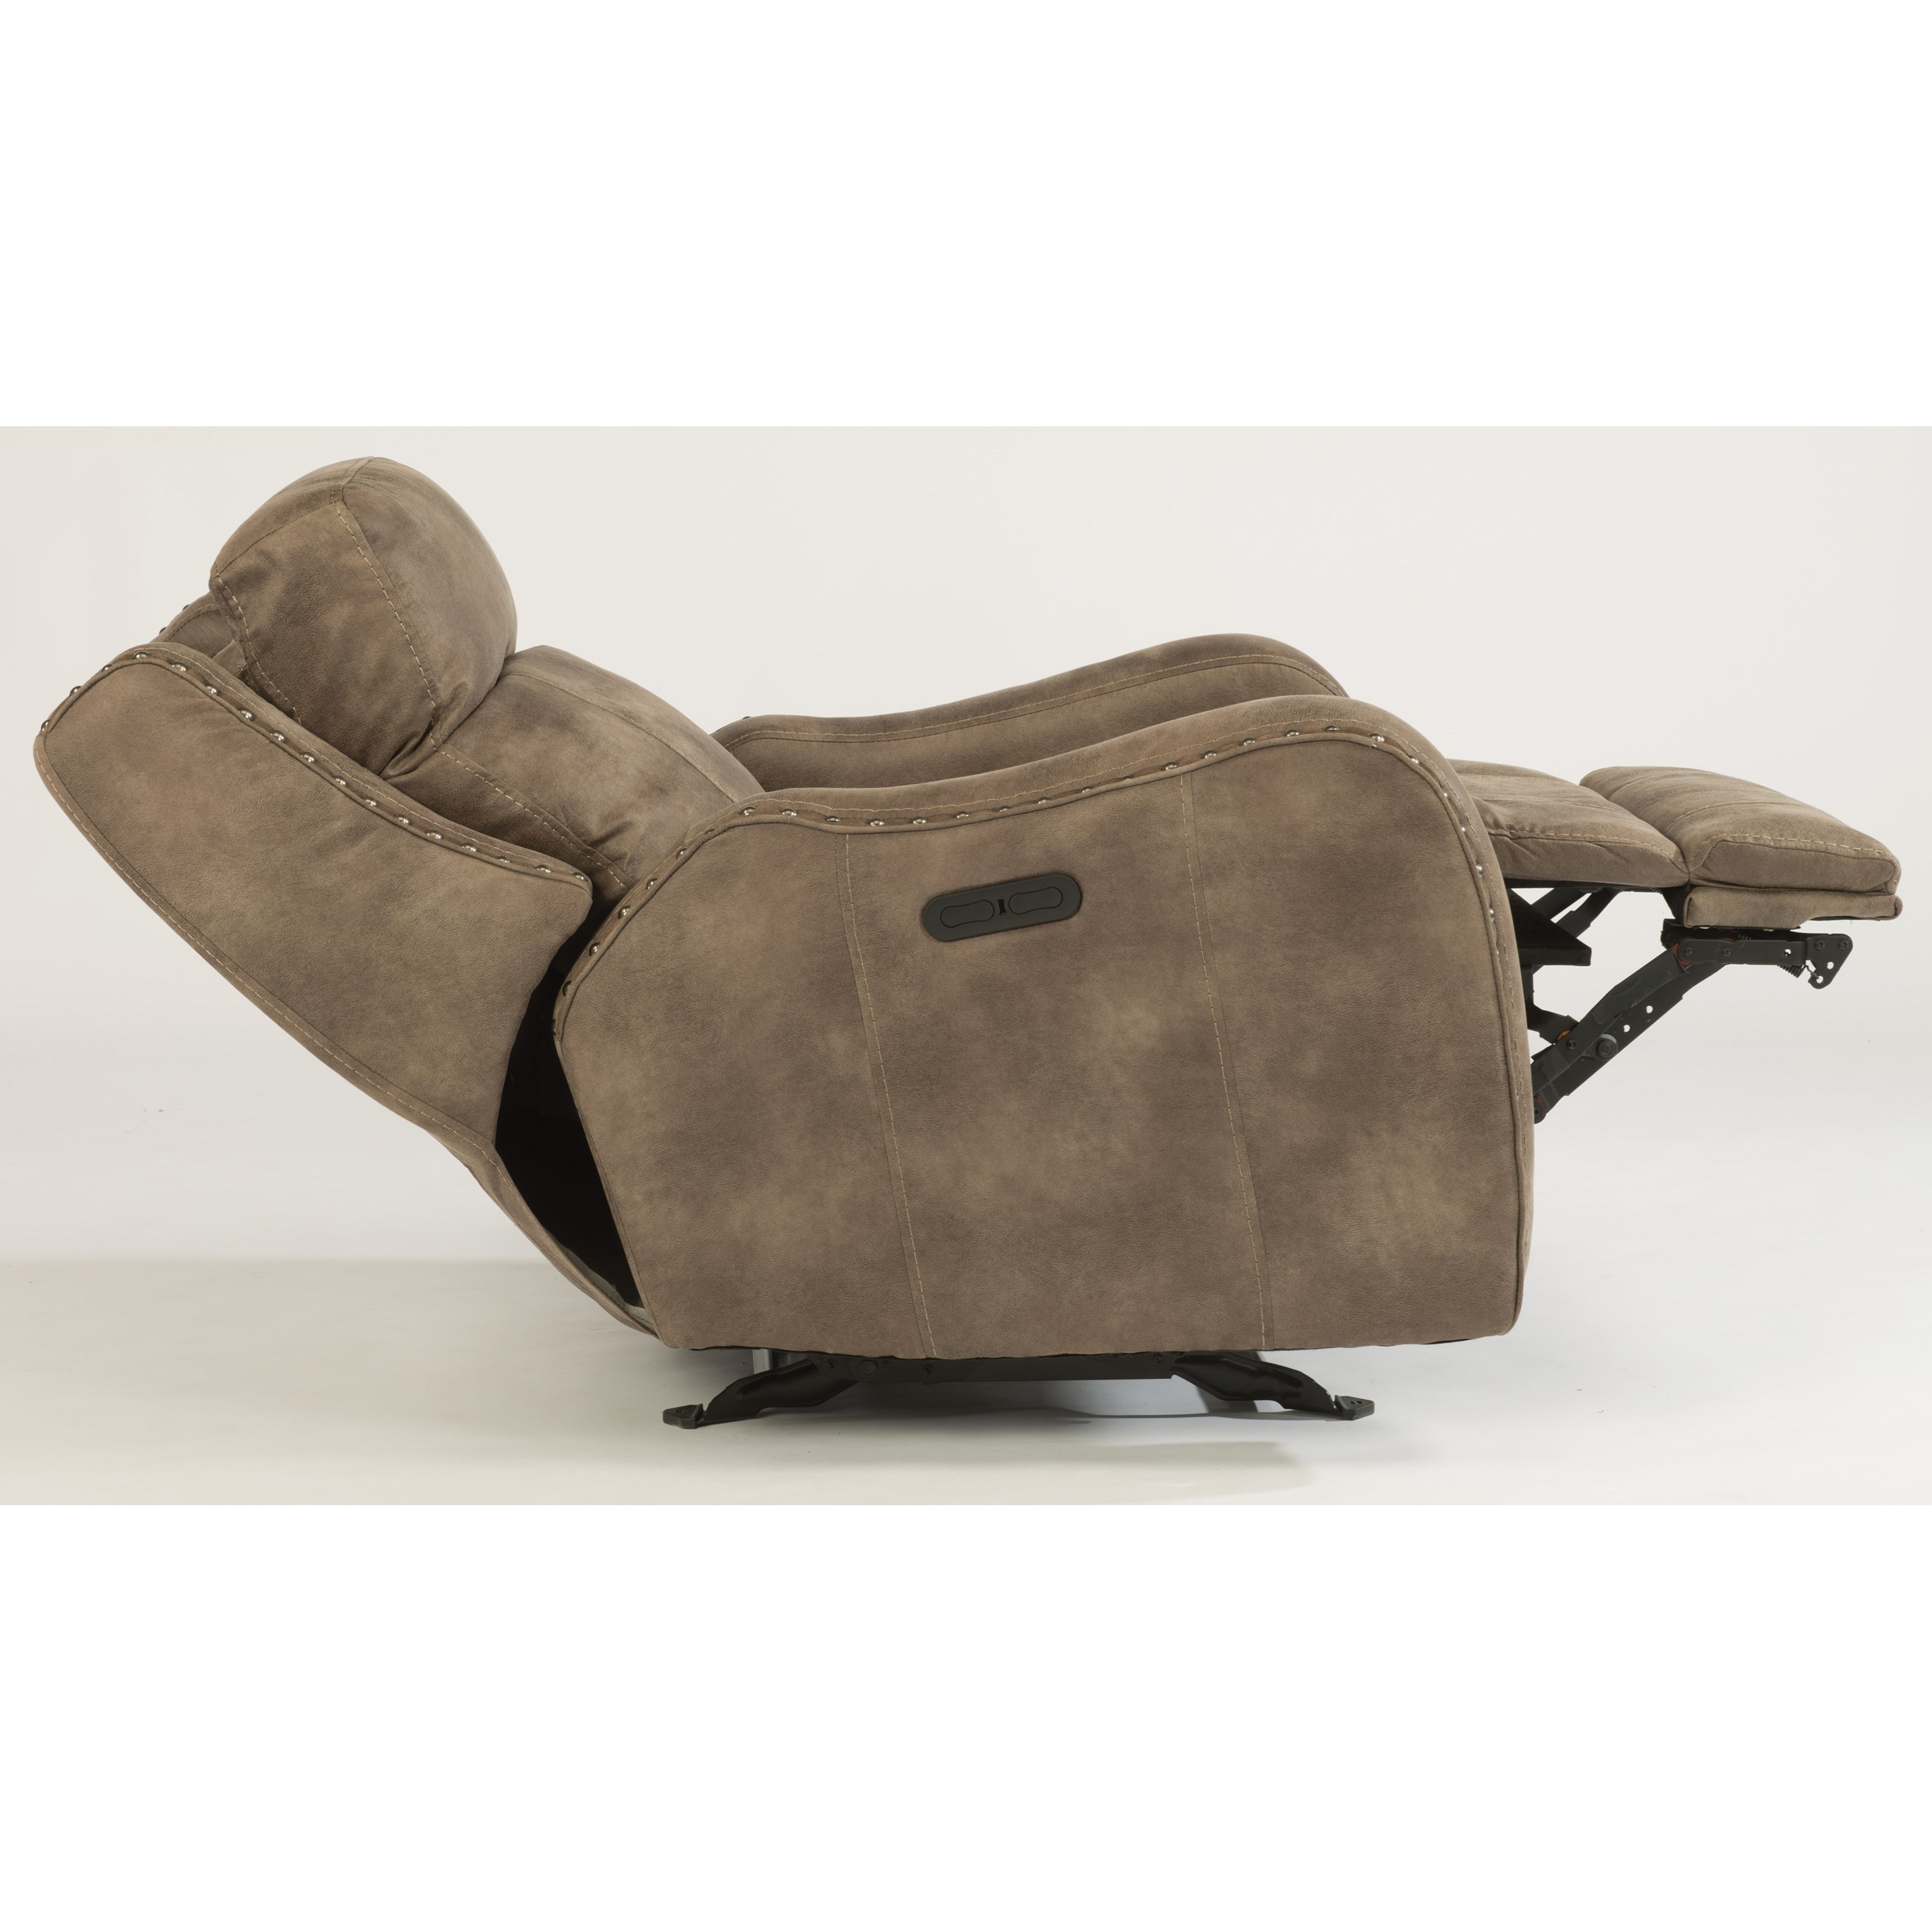 flexsteel power glider recliner with power adjustable headrest and usb port